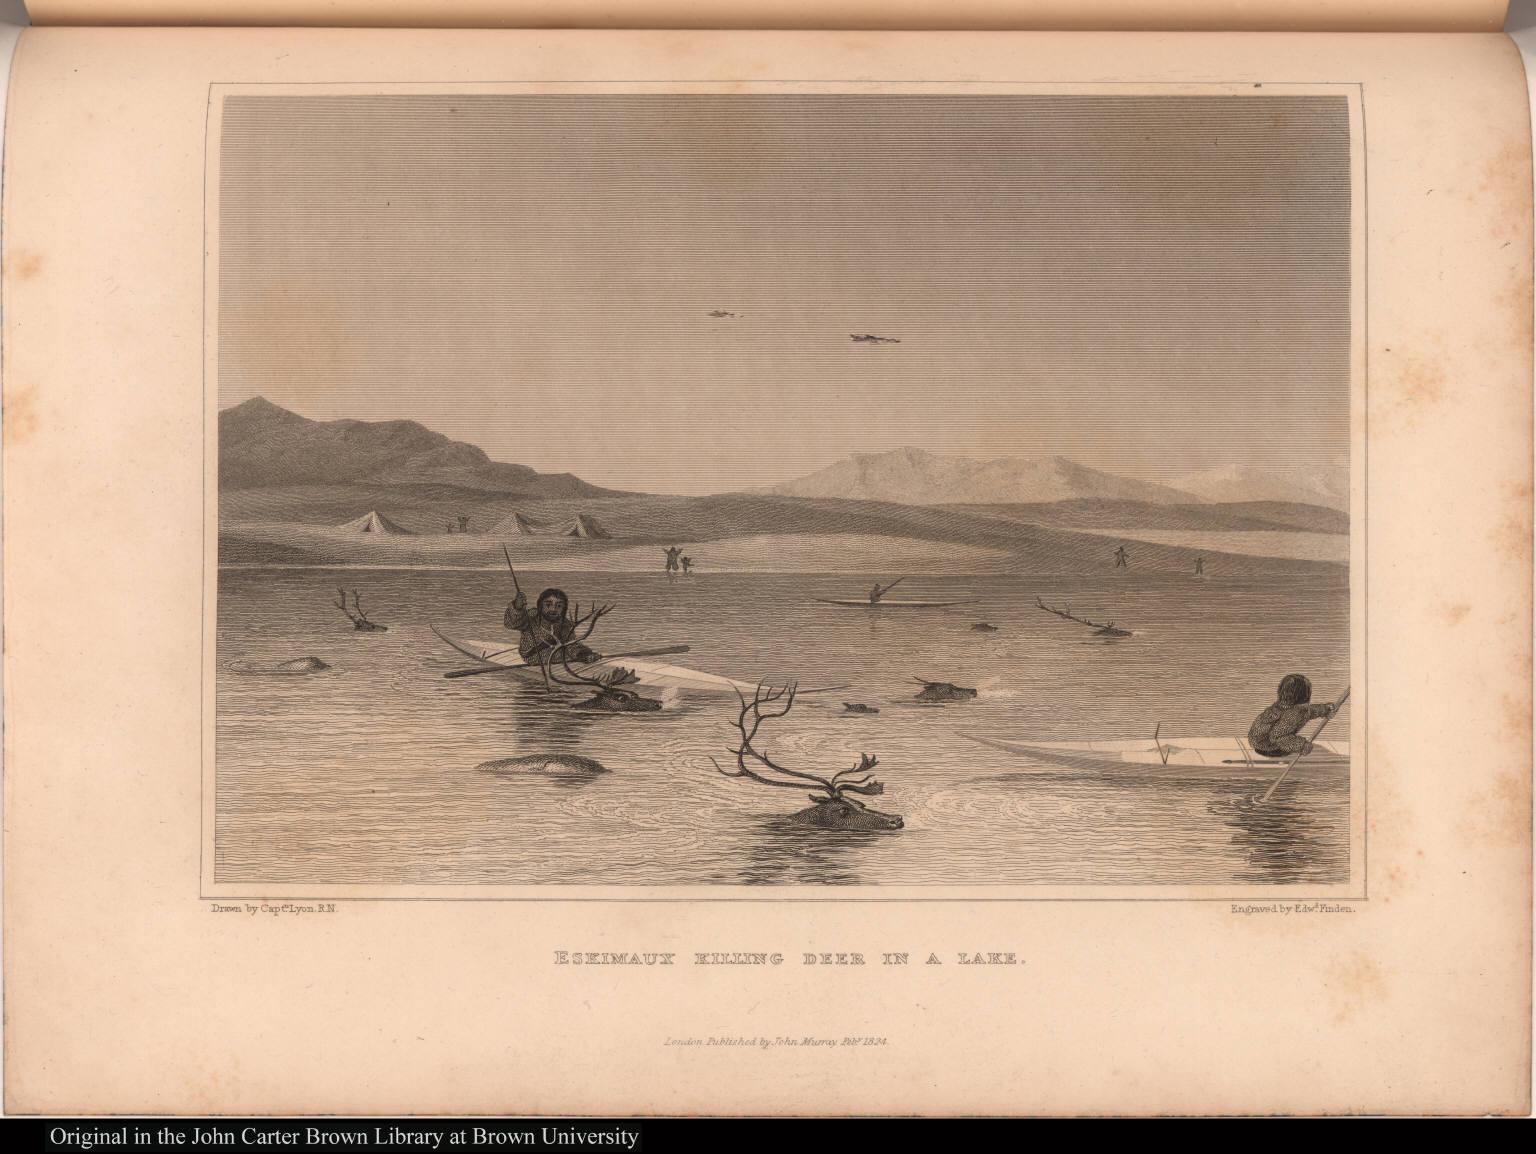 Eskimaux Killing Deer in a Lake.